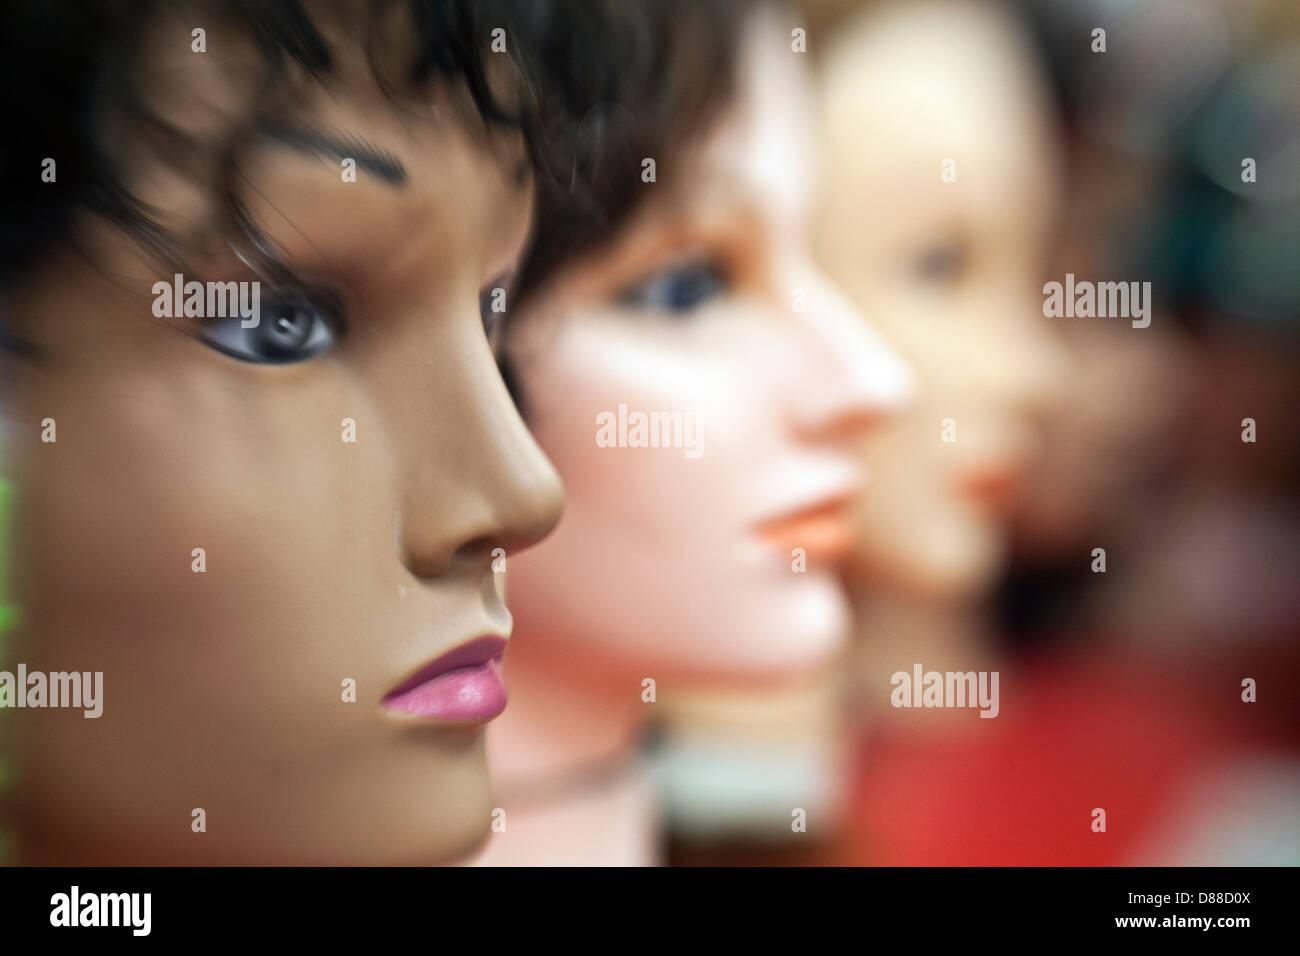 mannequin head lineup - Stock Image